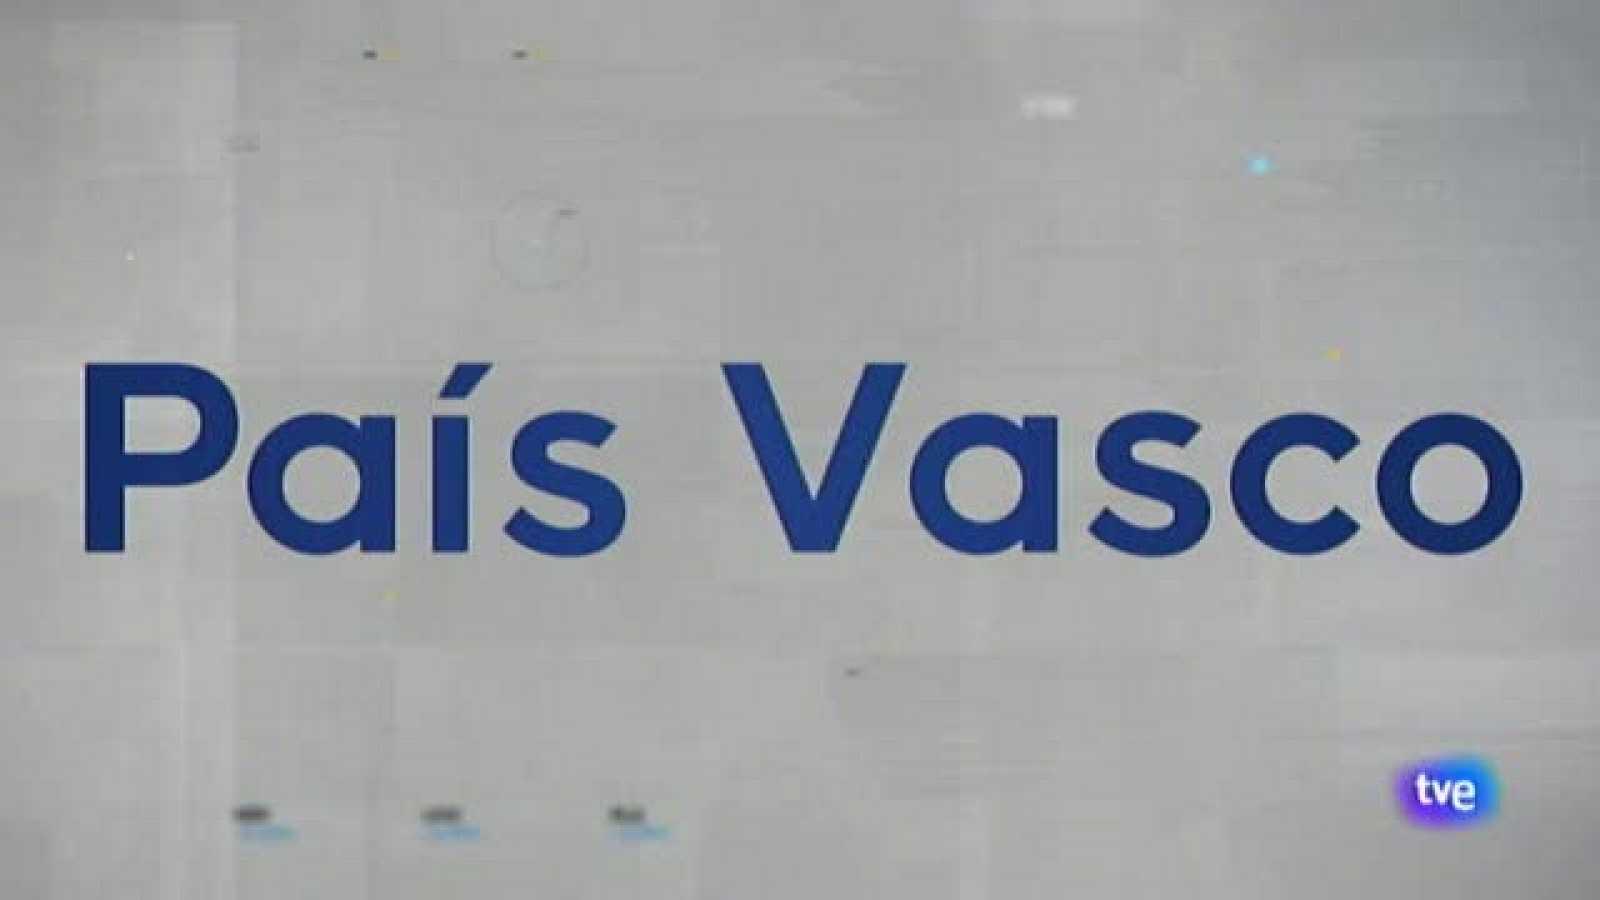 Telenorte 2 País Vasco 18/02/21